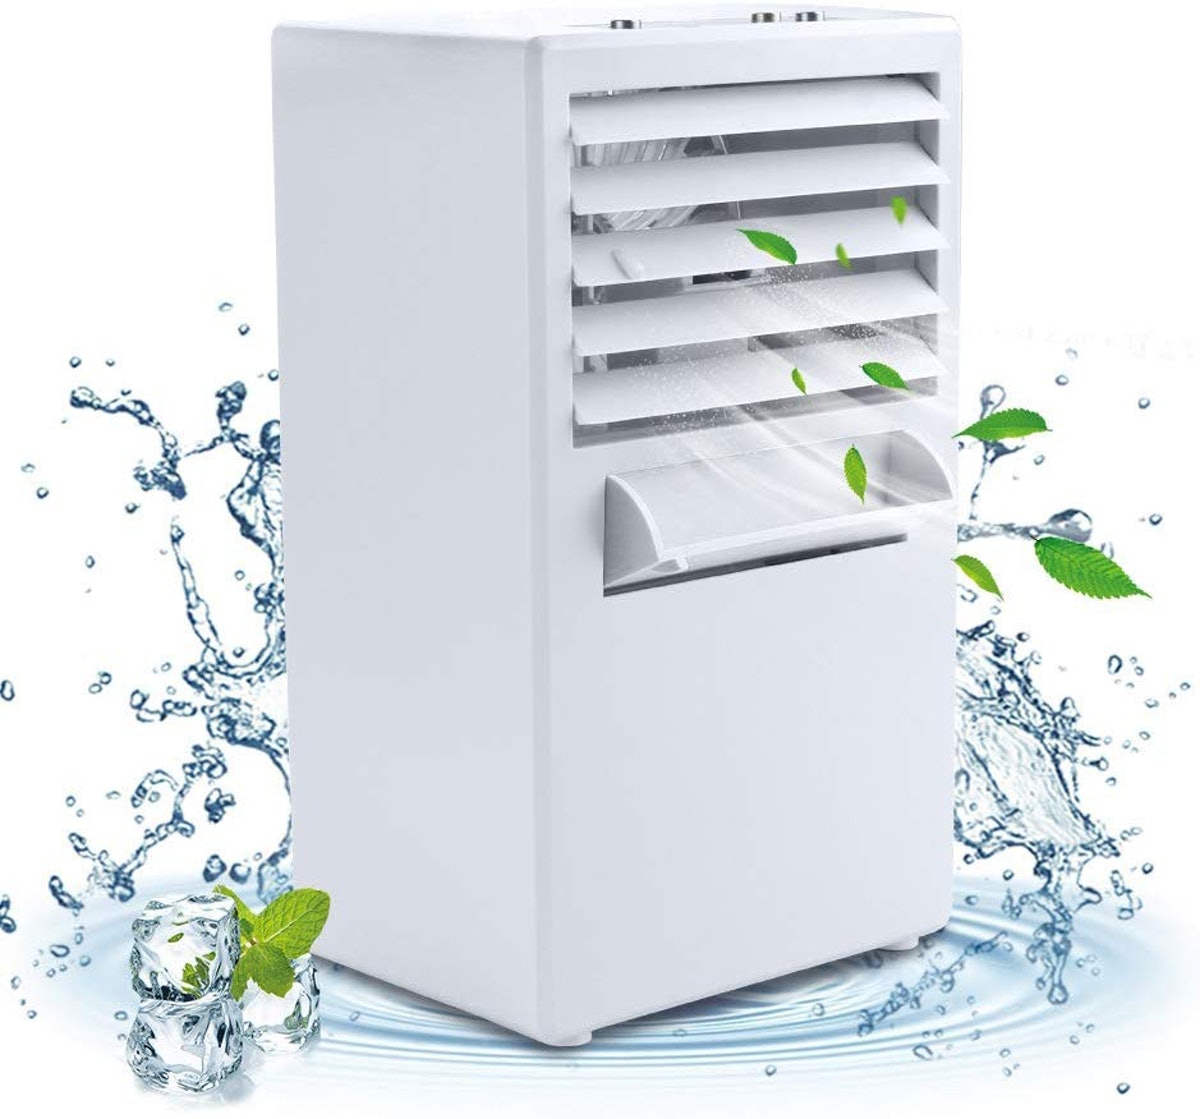 Vshow Portable Air Conditioner